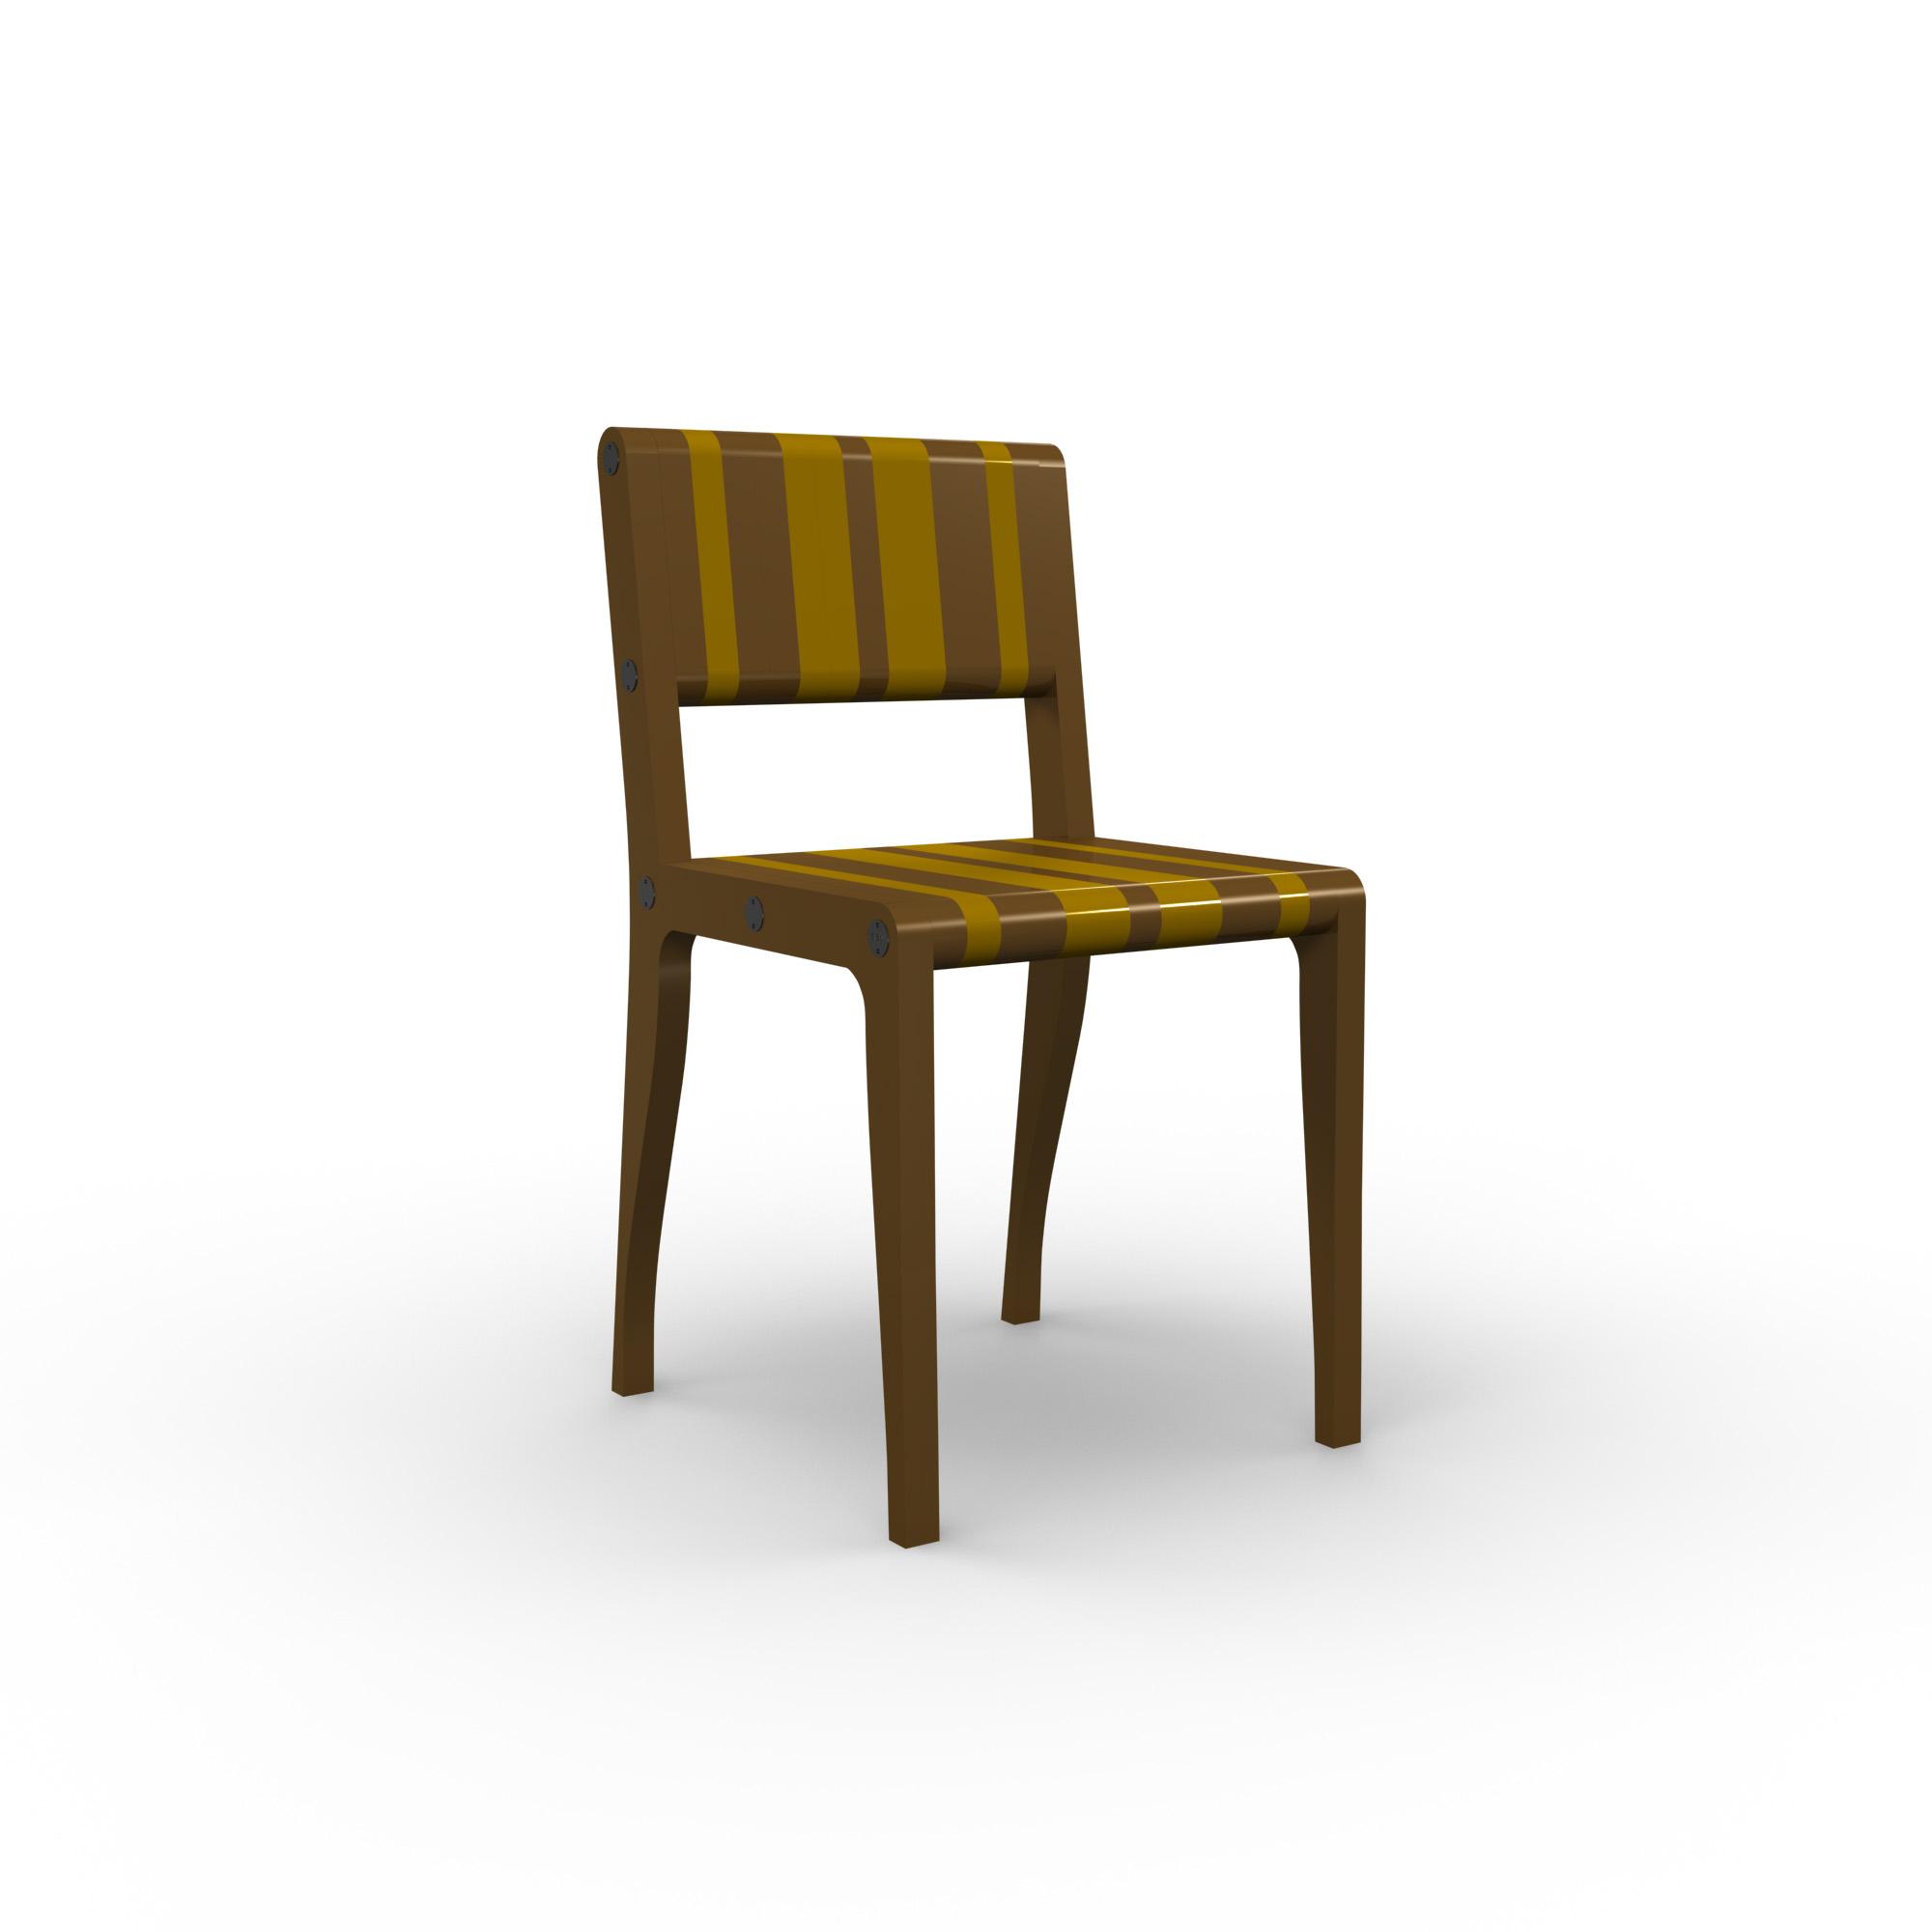 diseño industrial santander - Beusual - Sirak - silla directiva brown